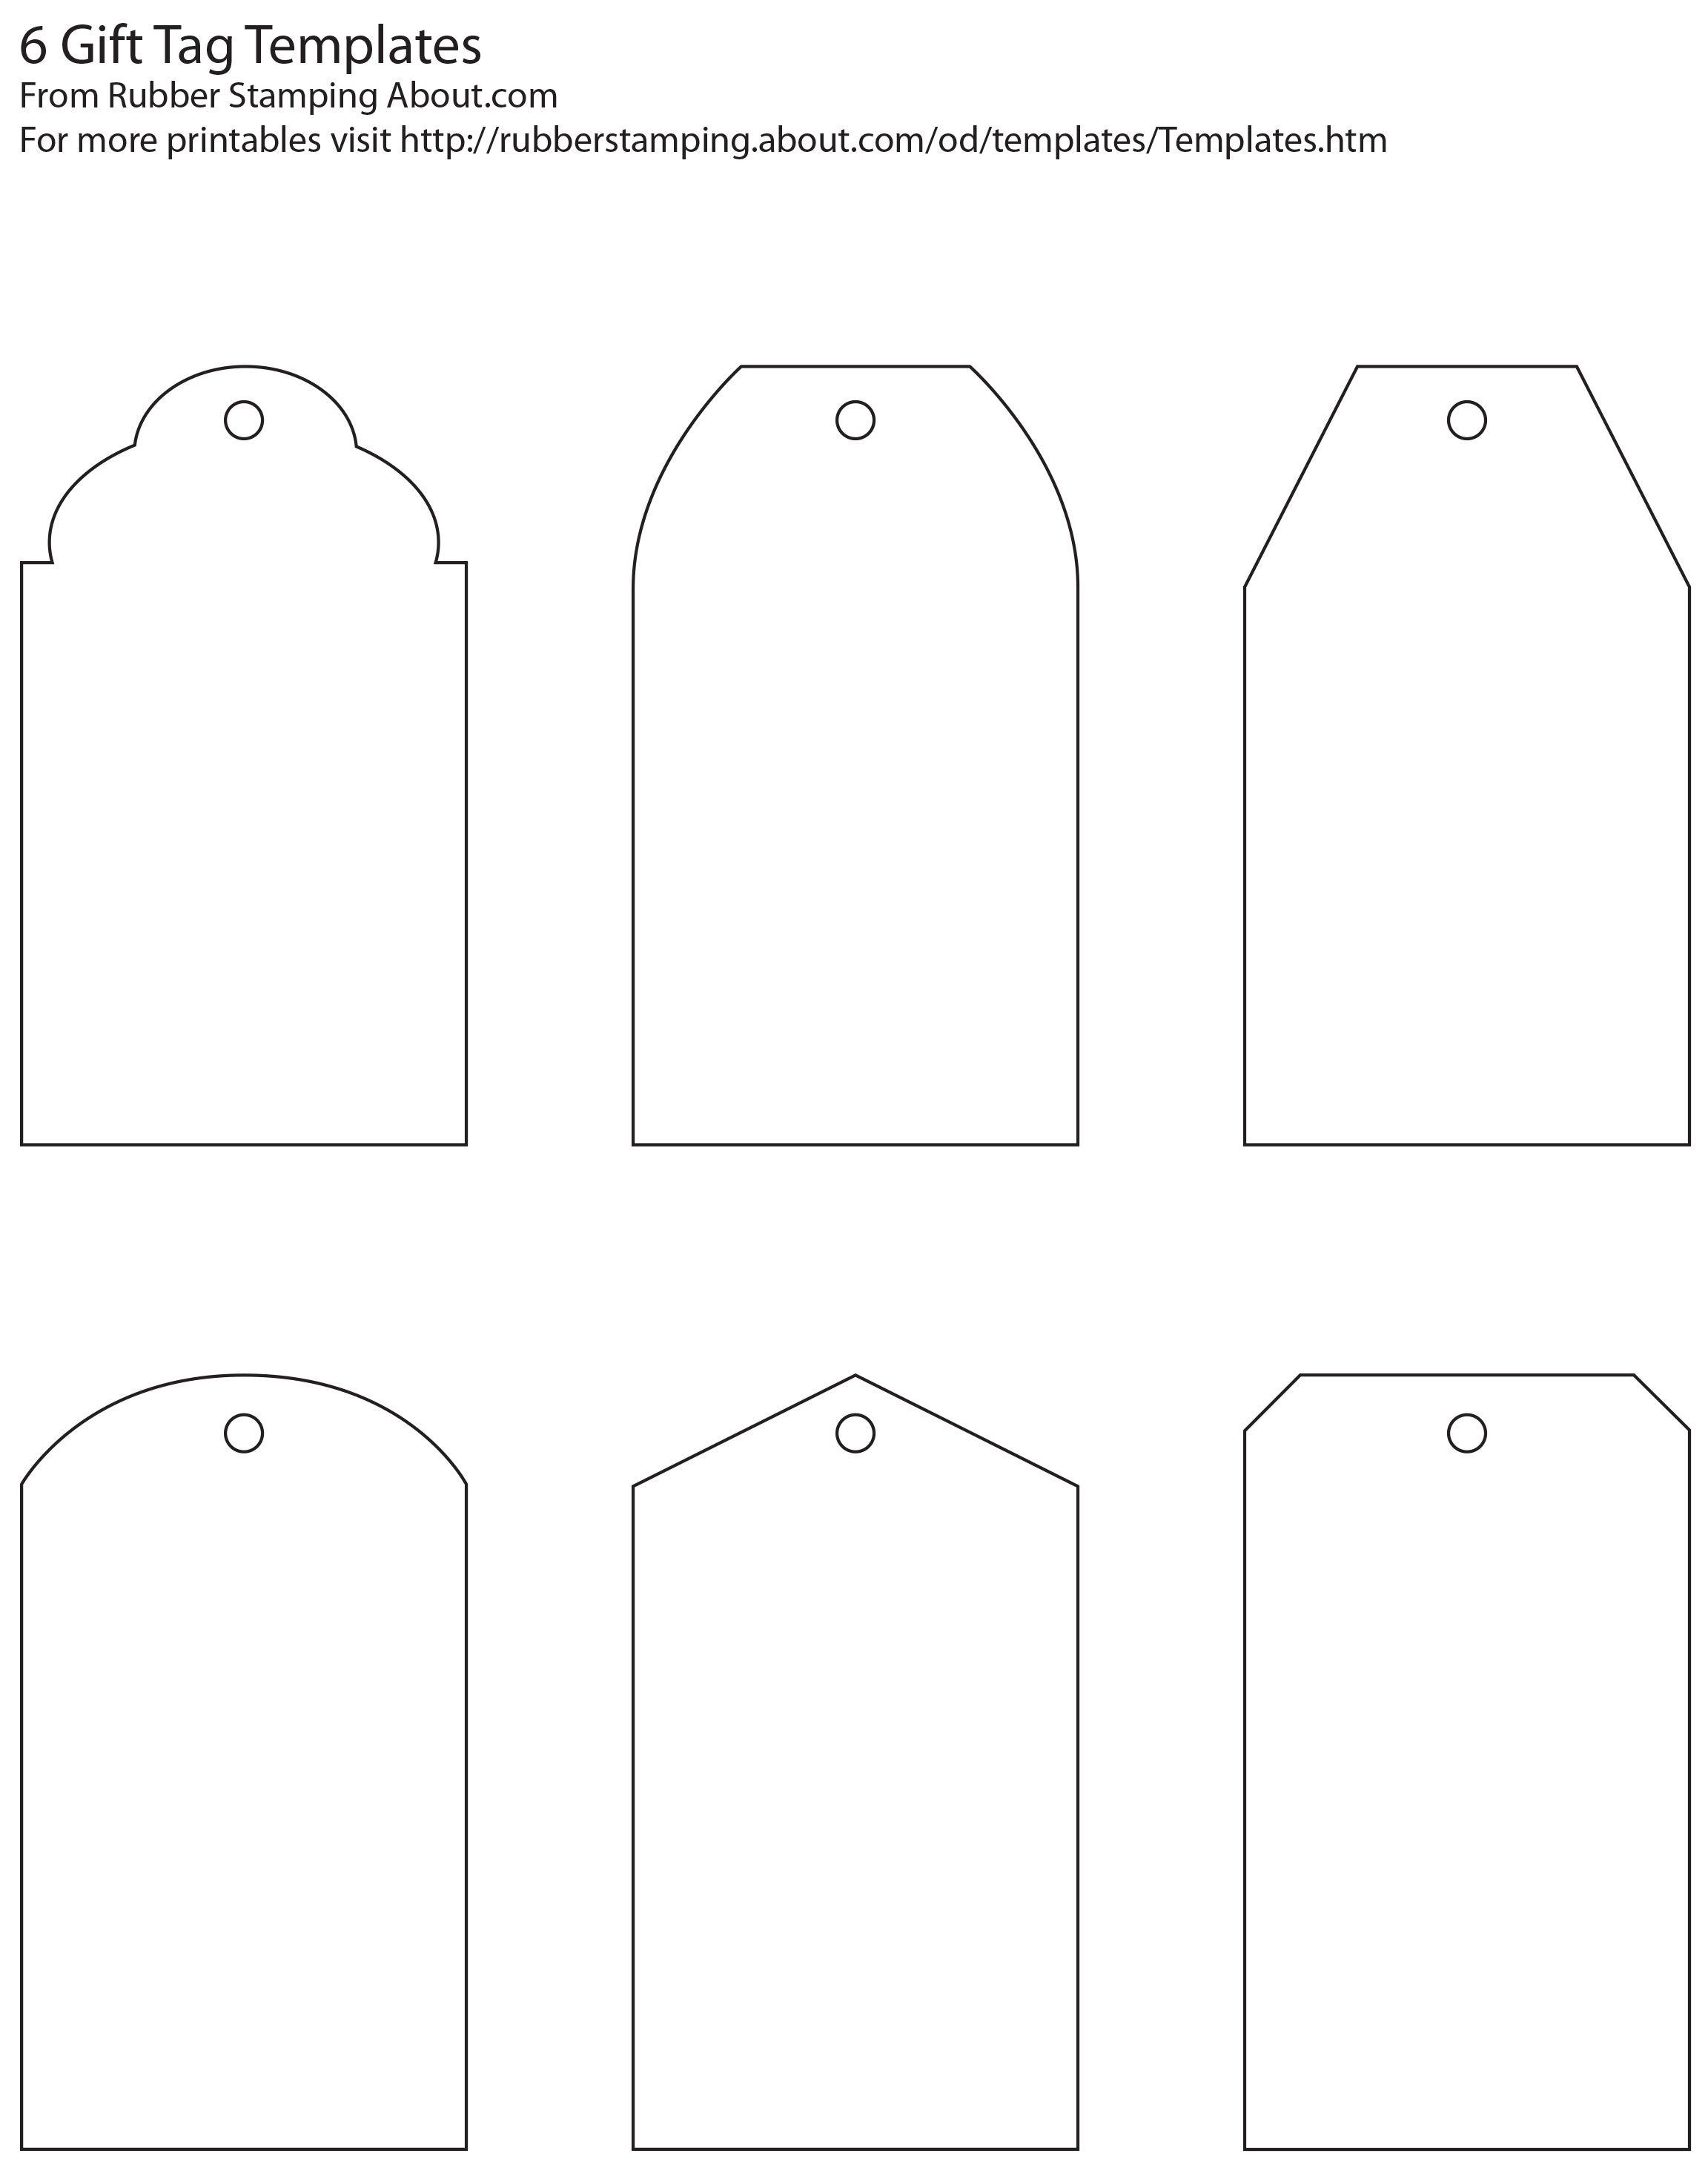 Free And Whimsical Printable Gift Tag Templates   Great Idea - Diy Gift Tags Free Printable